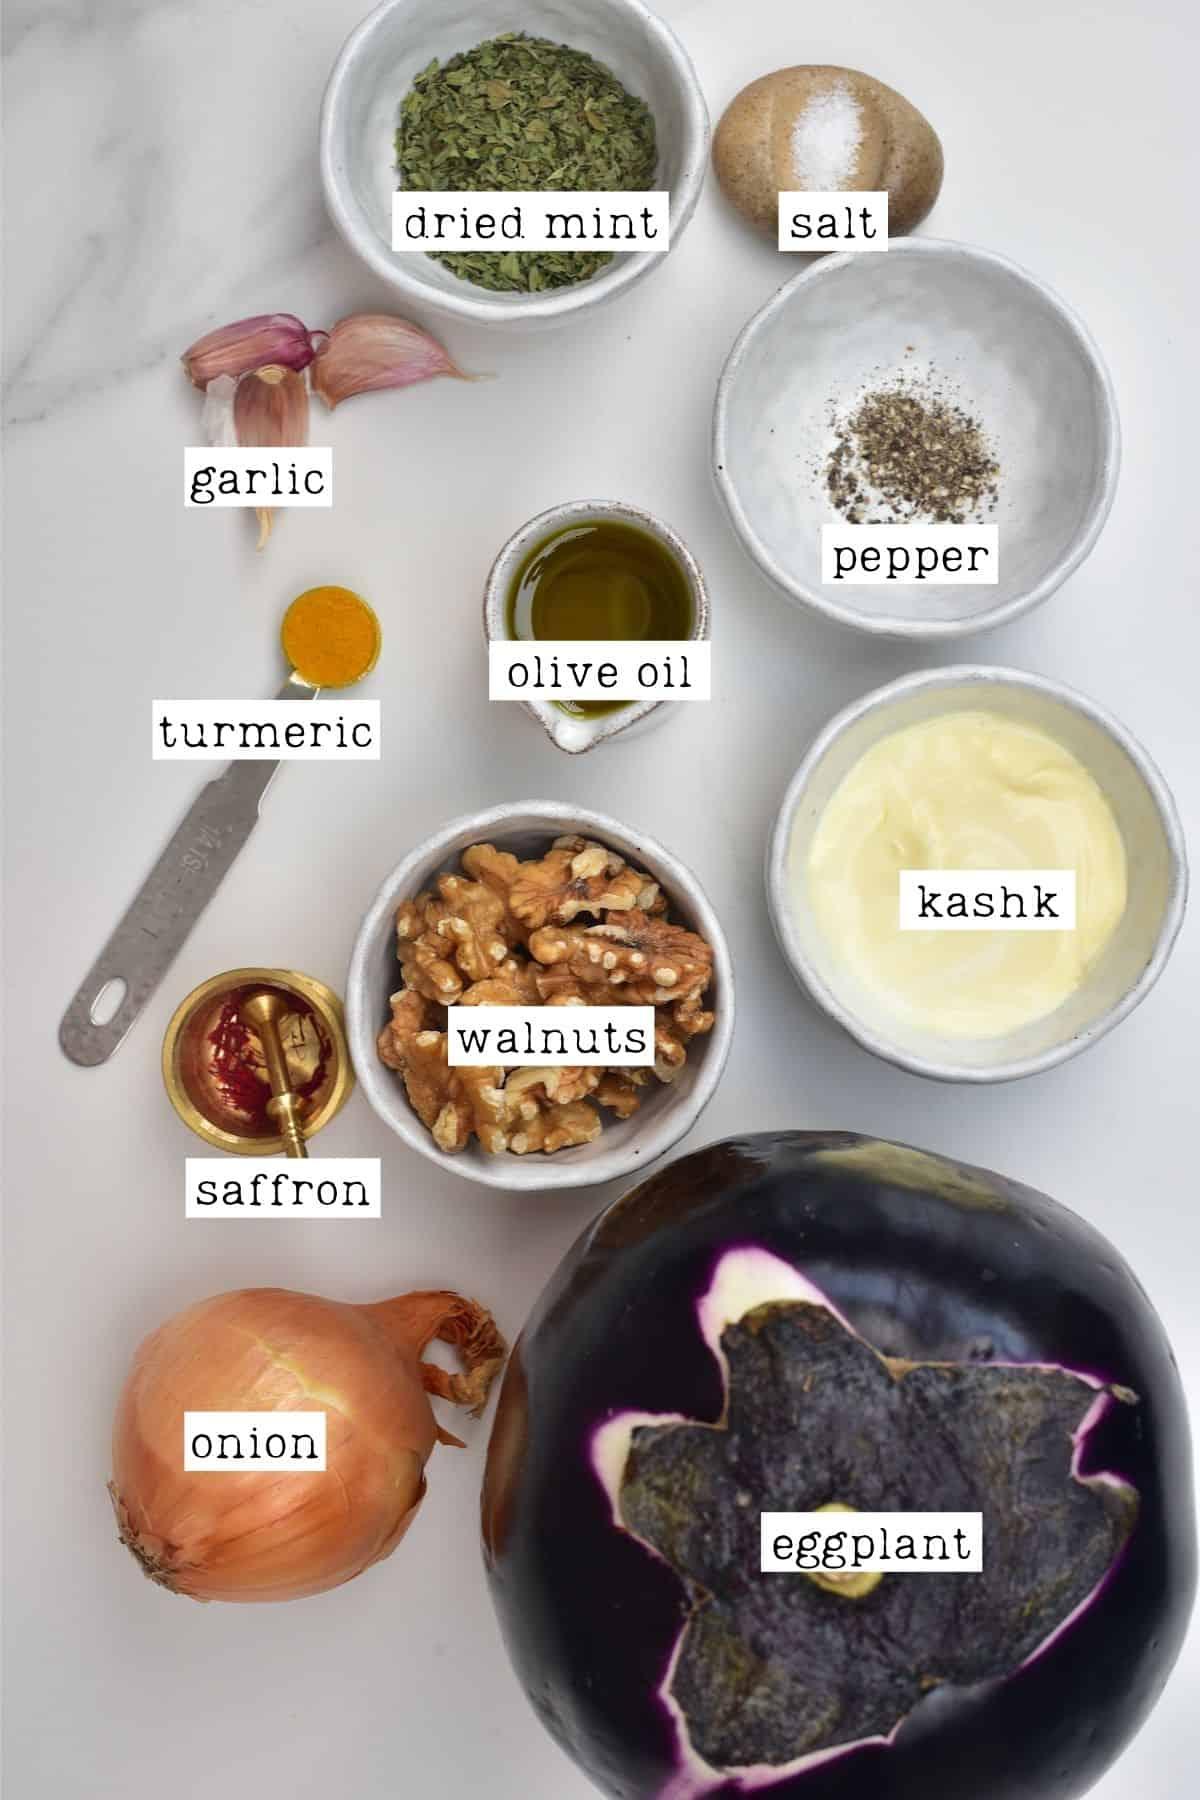 Ingredients for Persian eggplant dip